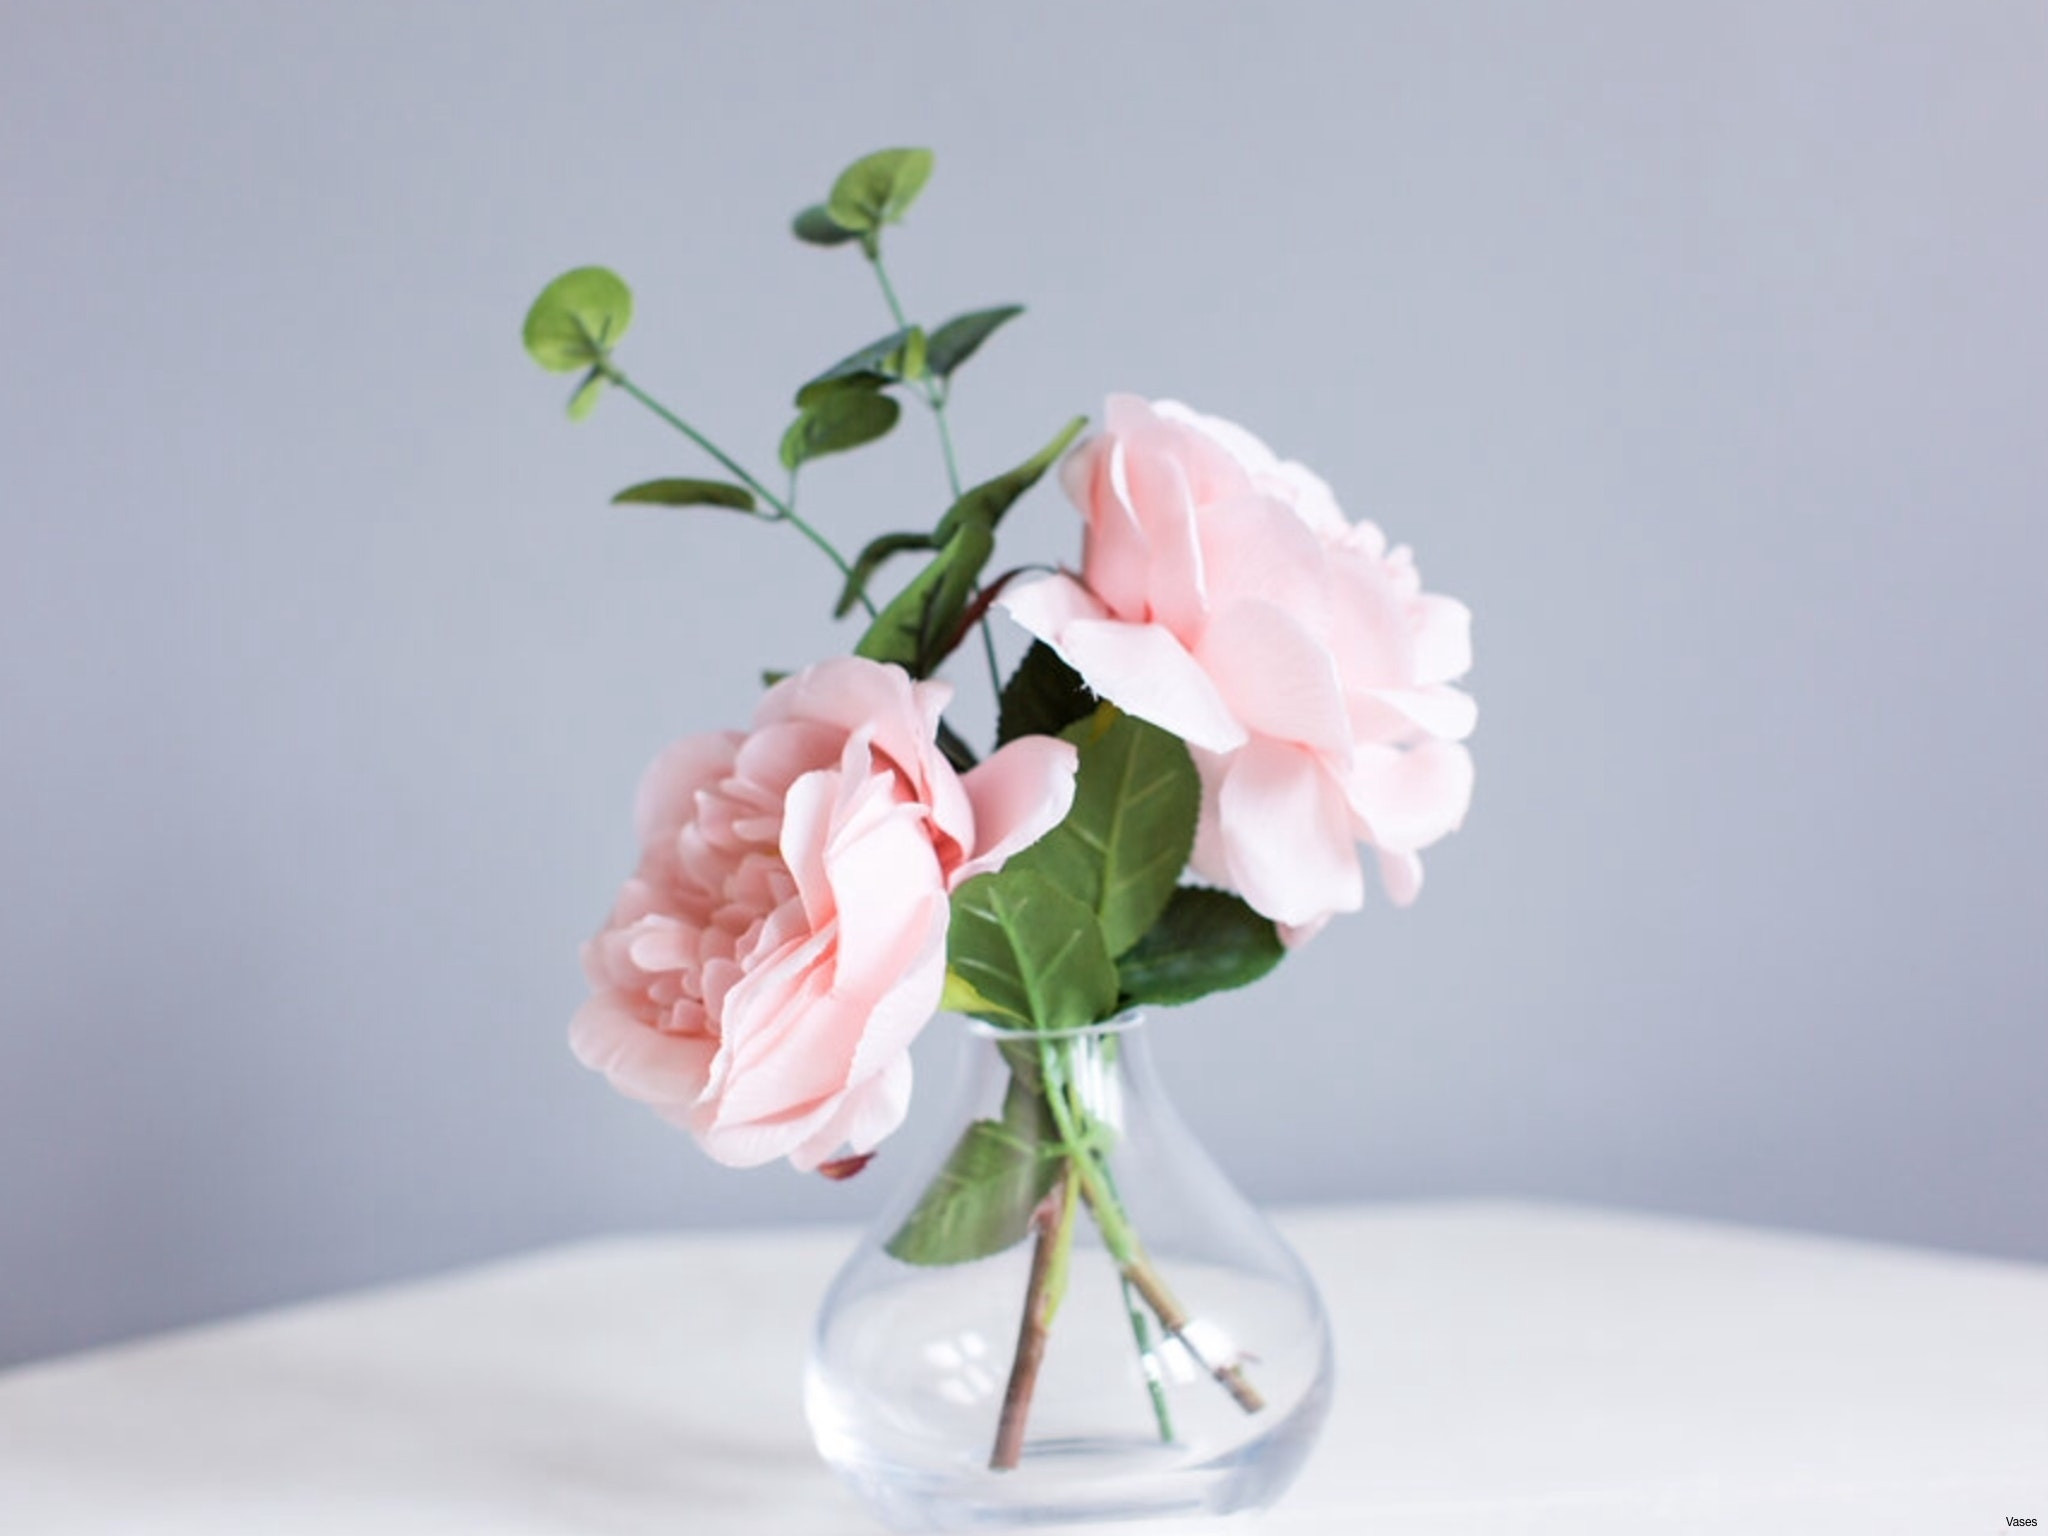 royal blue vase fillers of 27 beautiful flower vase definition flower decoration ideas throughout flower vase definition awesome 36 beautiful picture arrangements